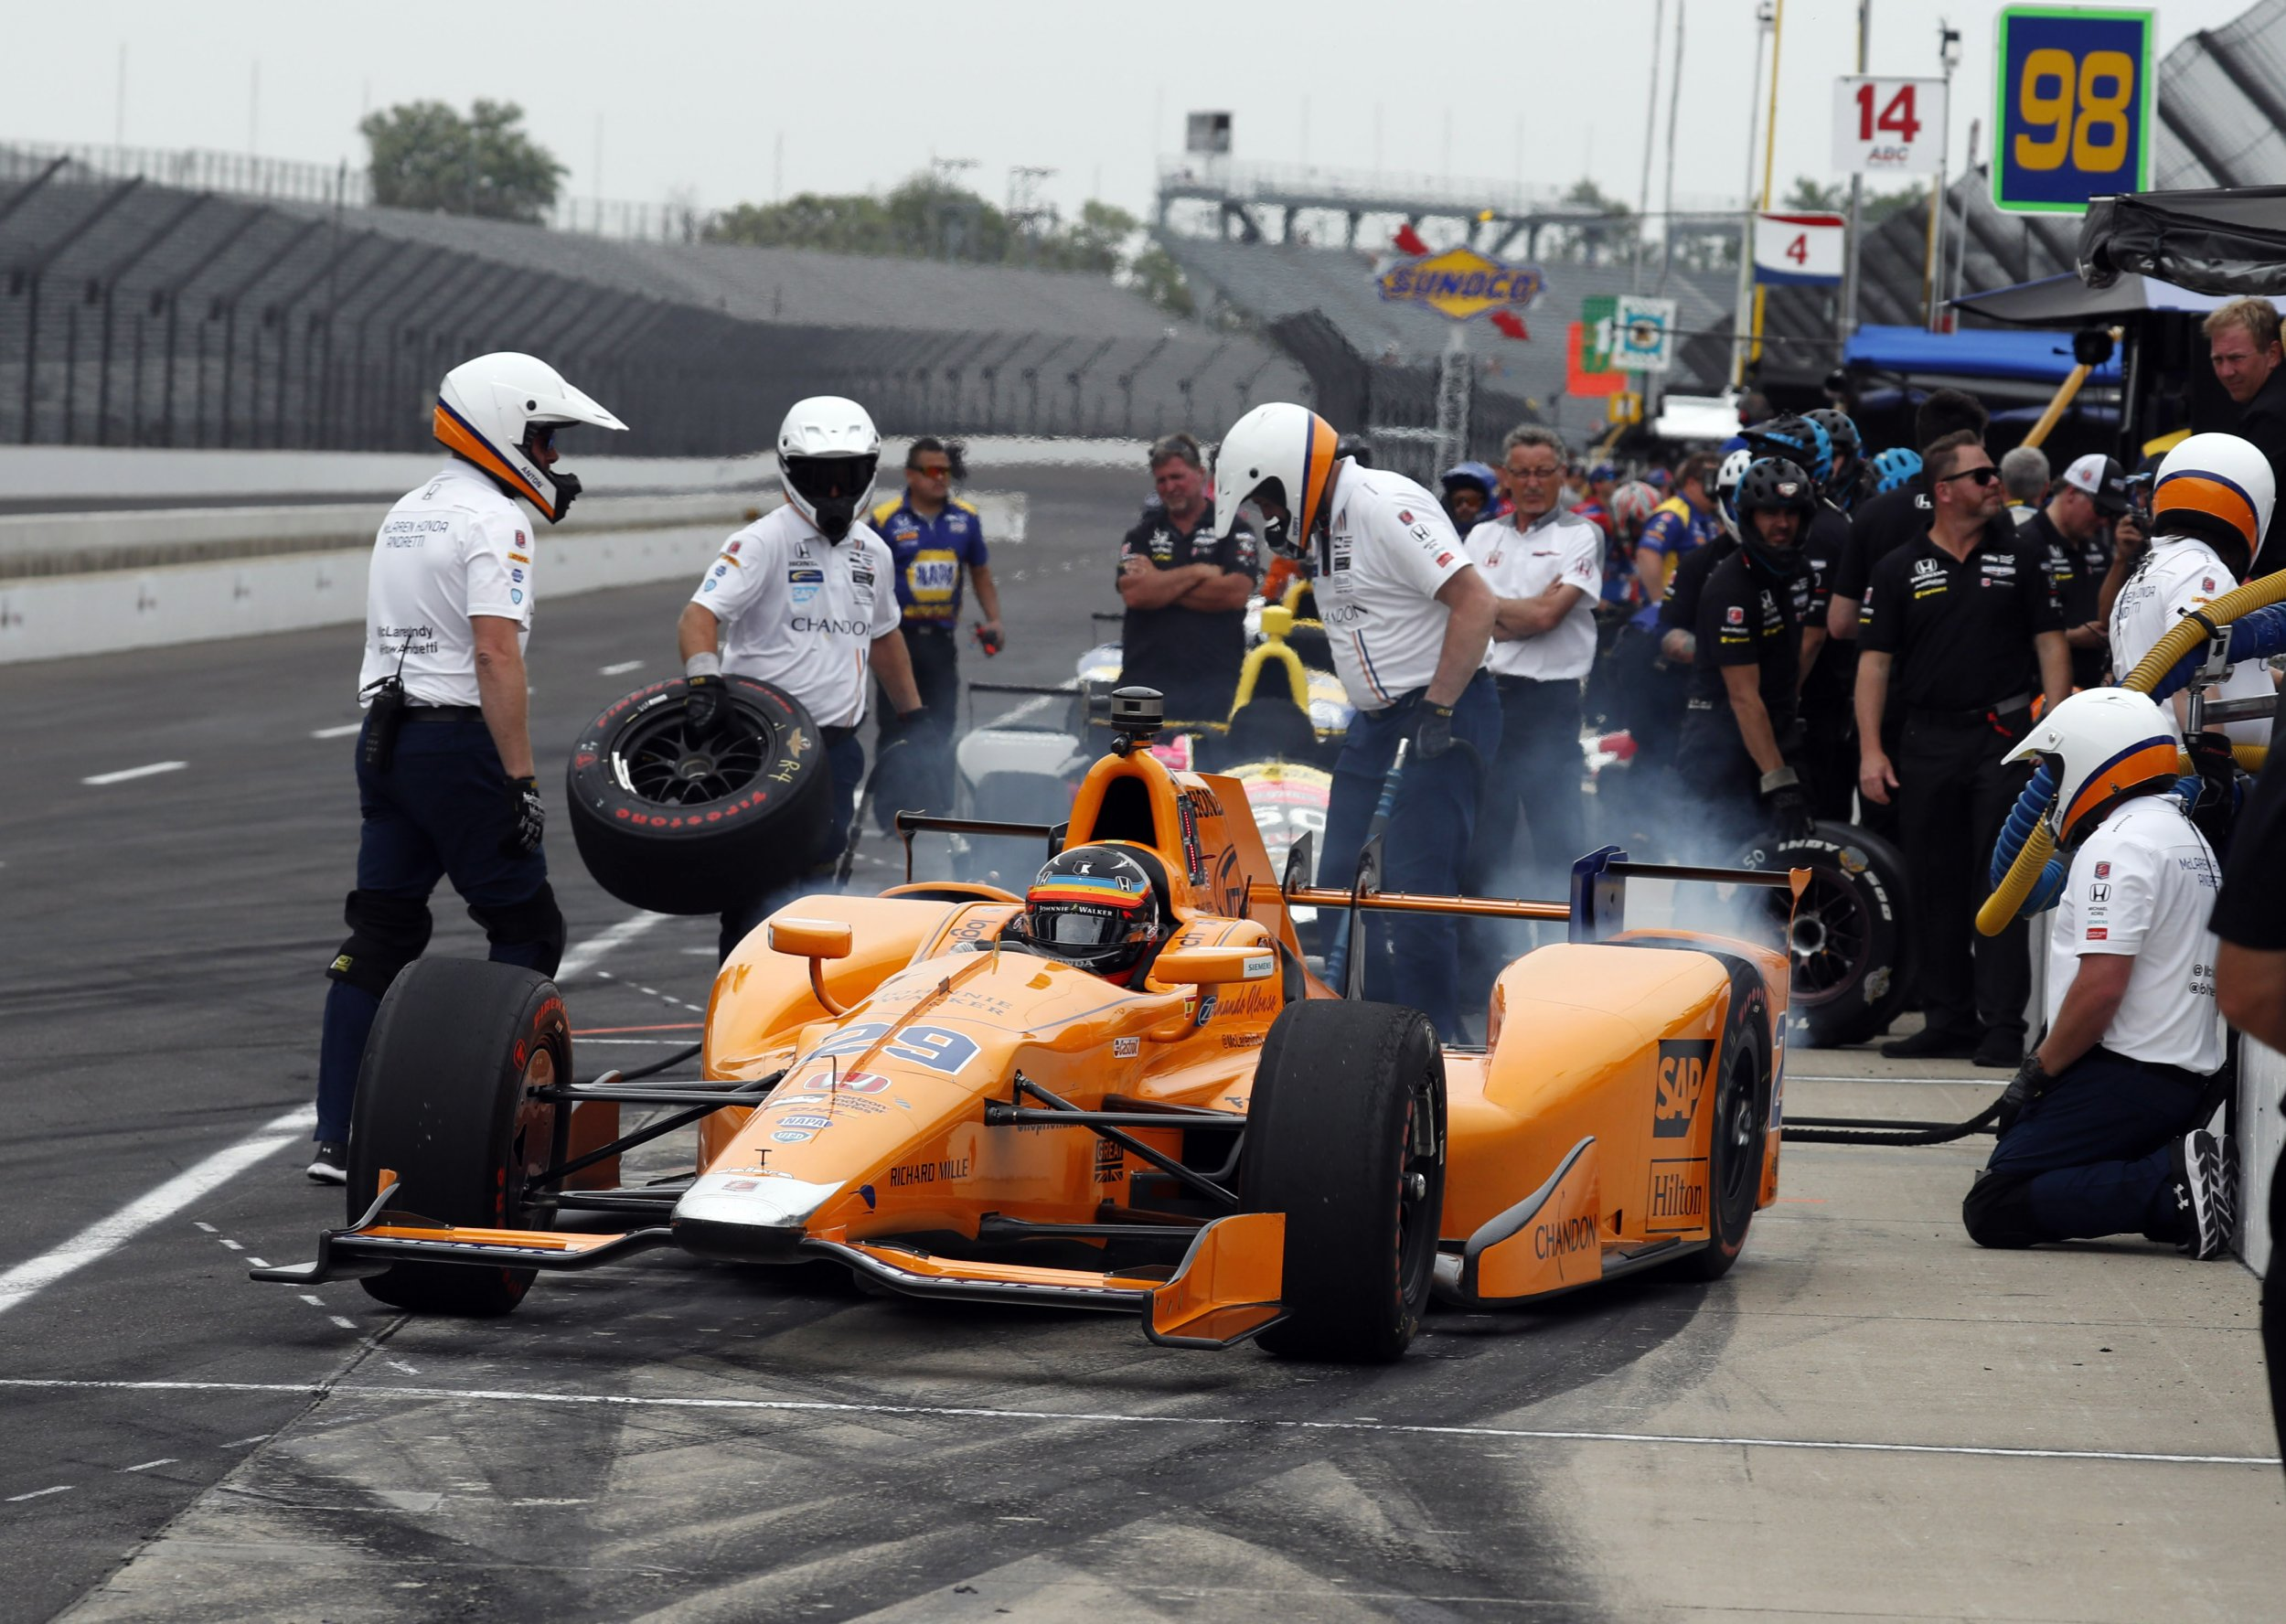 Fernando Alonso at Indianapolis Motor Speedway, Indiana, May 17.